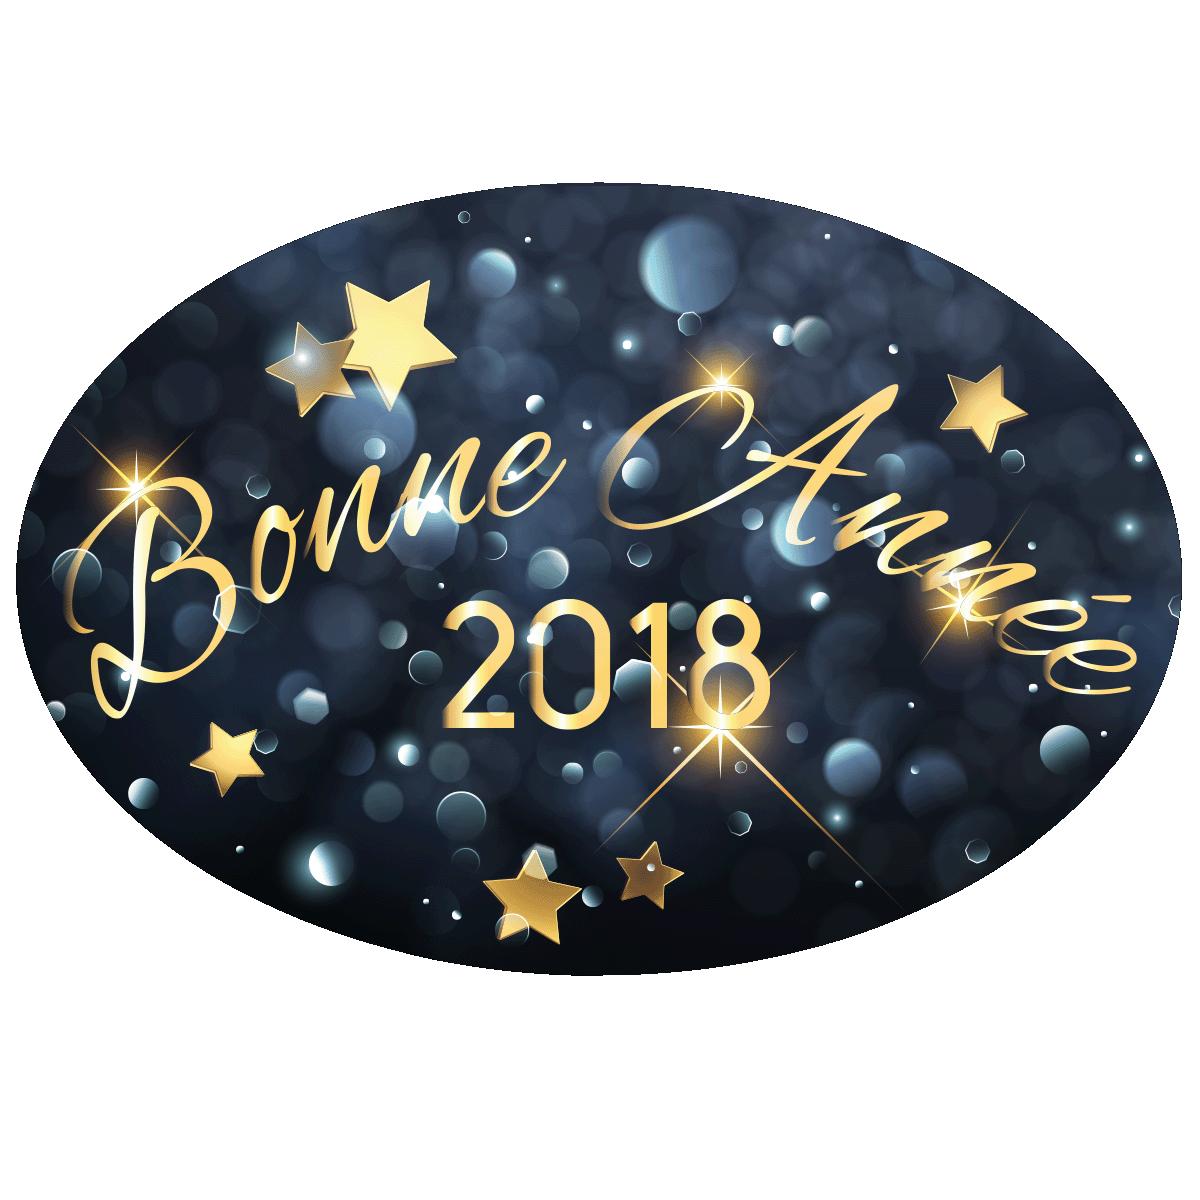 sticker bonne ann e 2018 stickers professionnels stickers vitrine magasin ambiance sticker. Black Bedroom Furniture Sets. Home Design Ideas